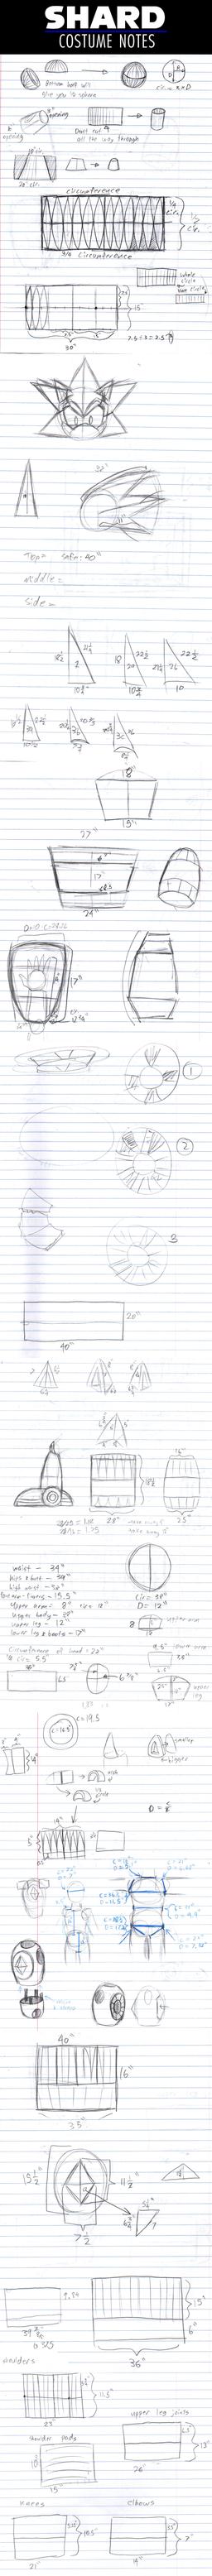 Shard costume notes by Xaolin26